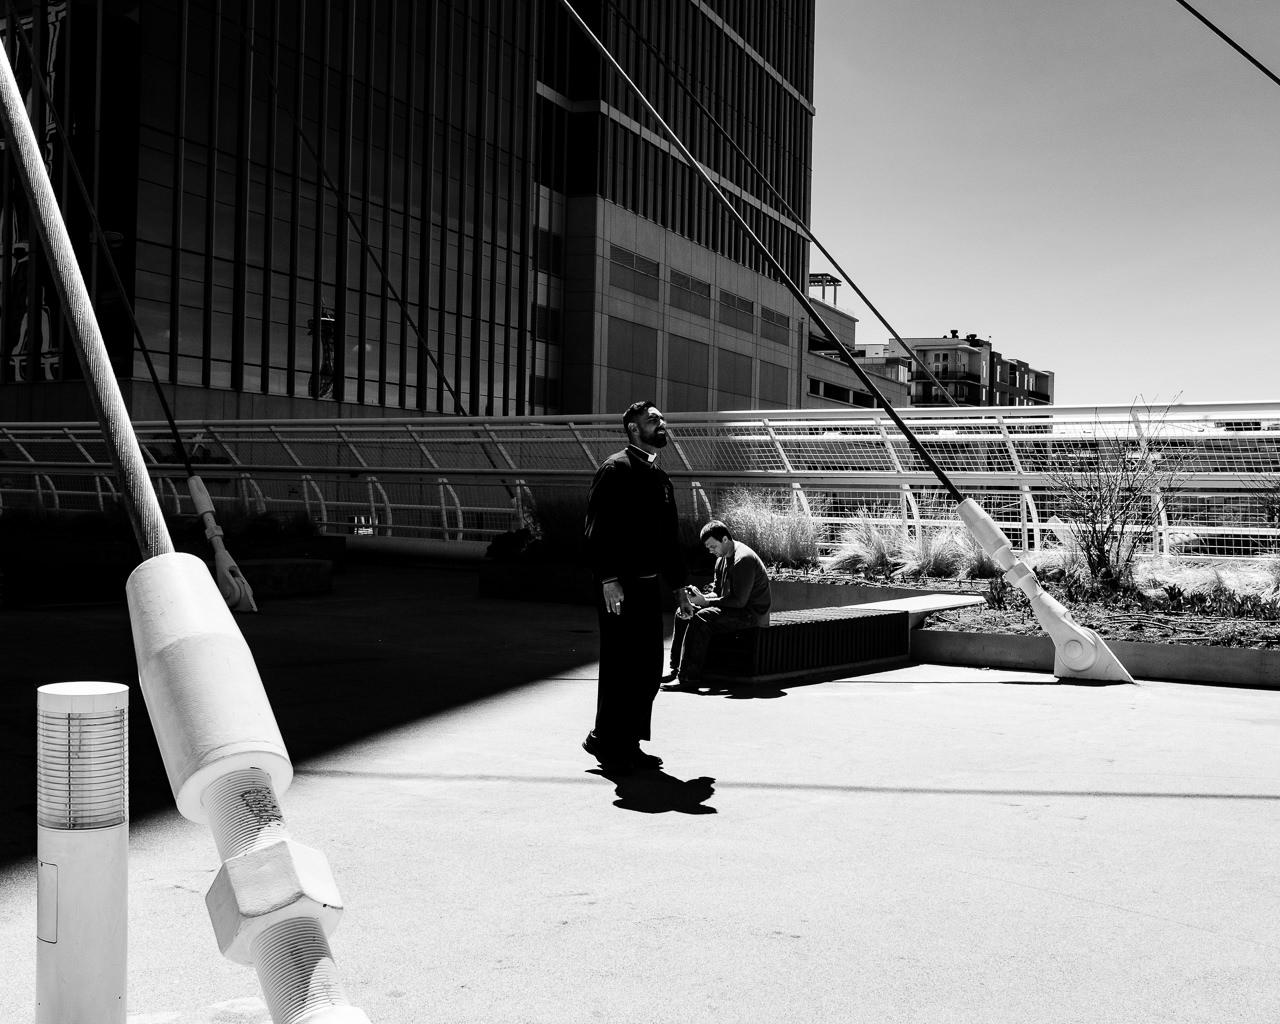 Day 110 - 365 Day B&W Photo Challenge - Priest walks into the light of the daytime sun on the Millenium Bridge in Denver, Colorado - Fuji X100F, Acros R Film Simulation